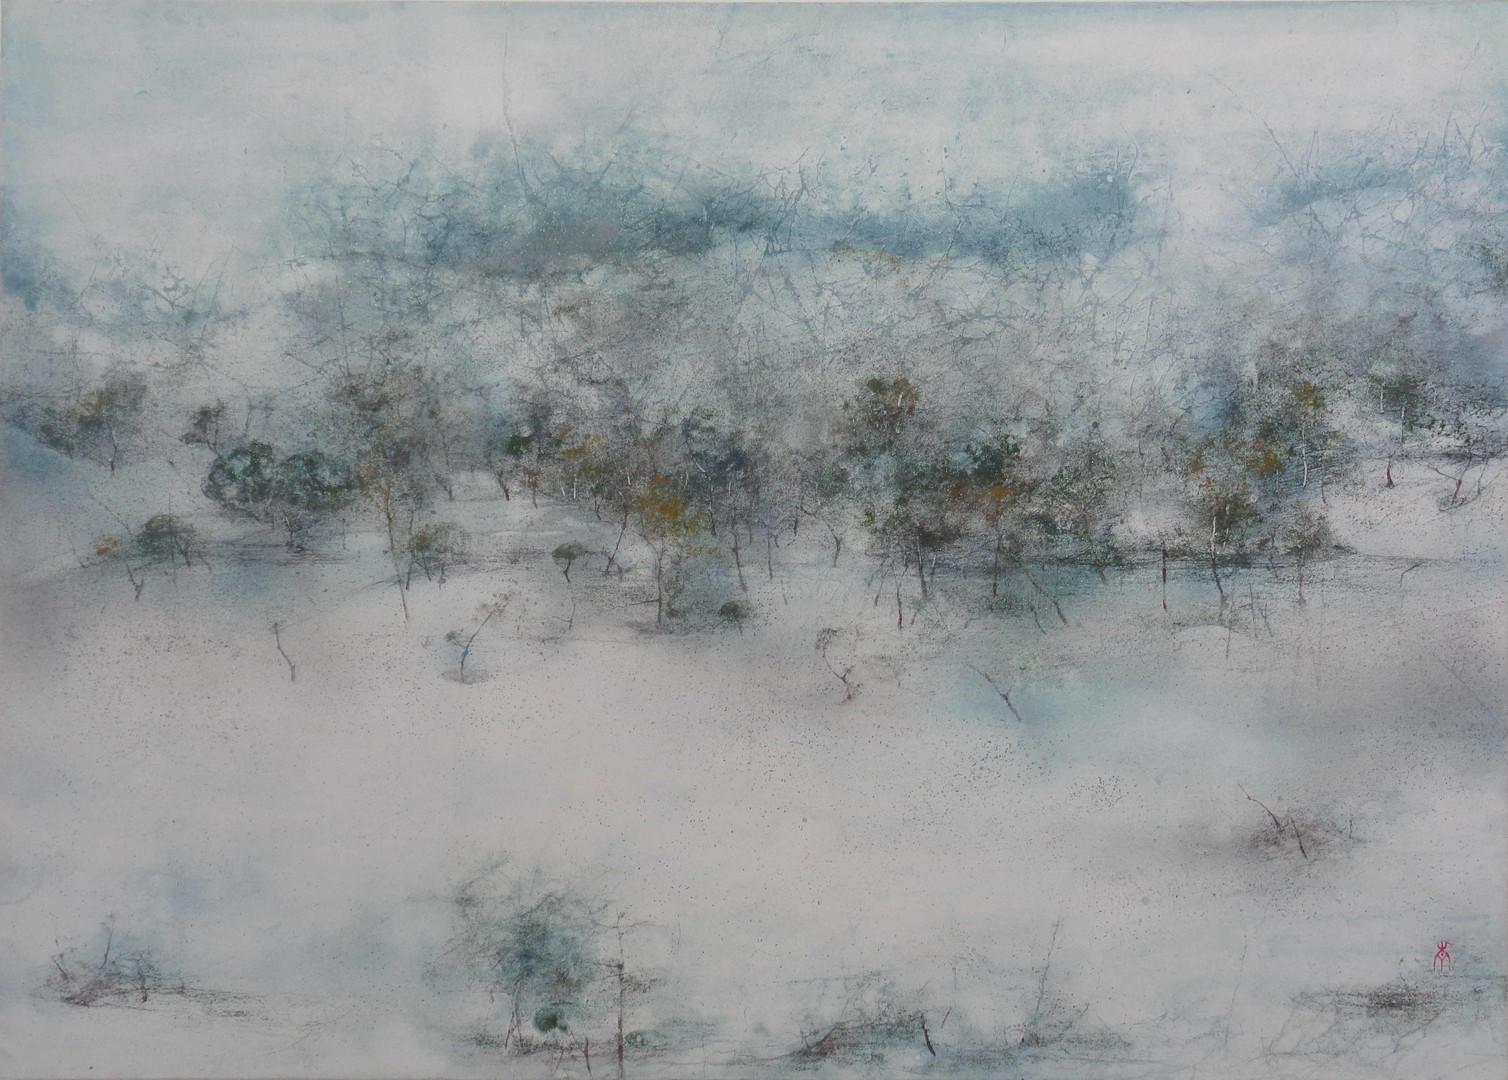 Serene - 50 x 70 cm / 2020